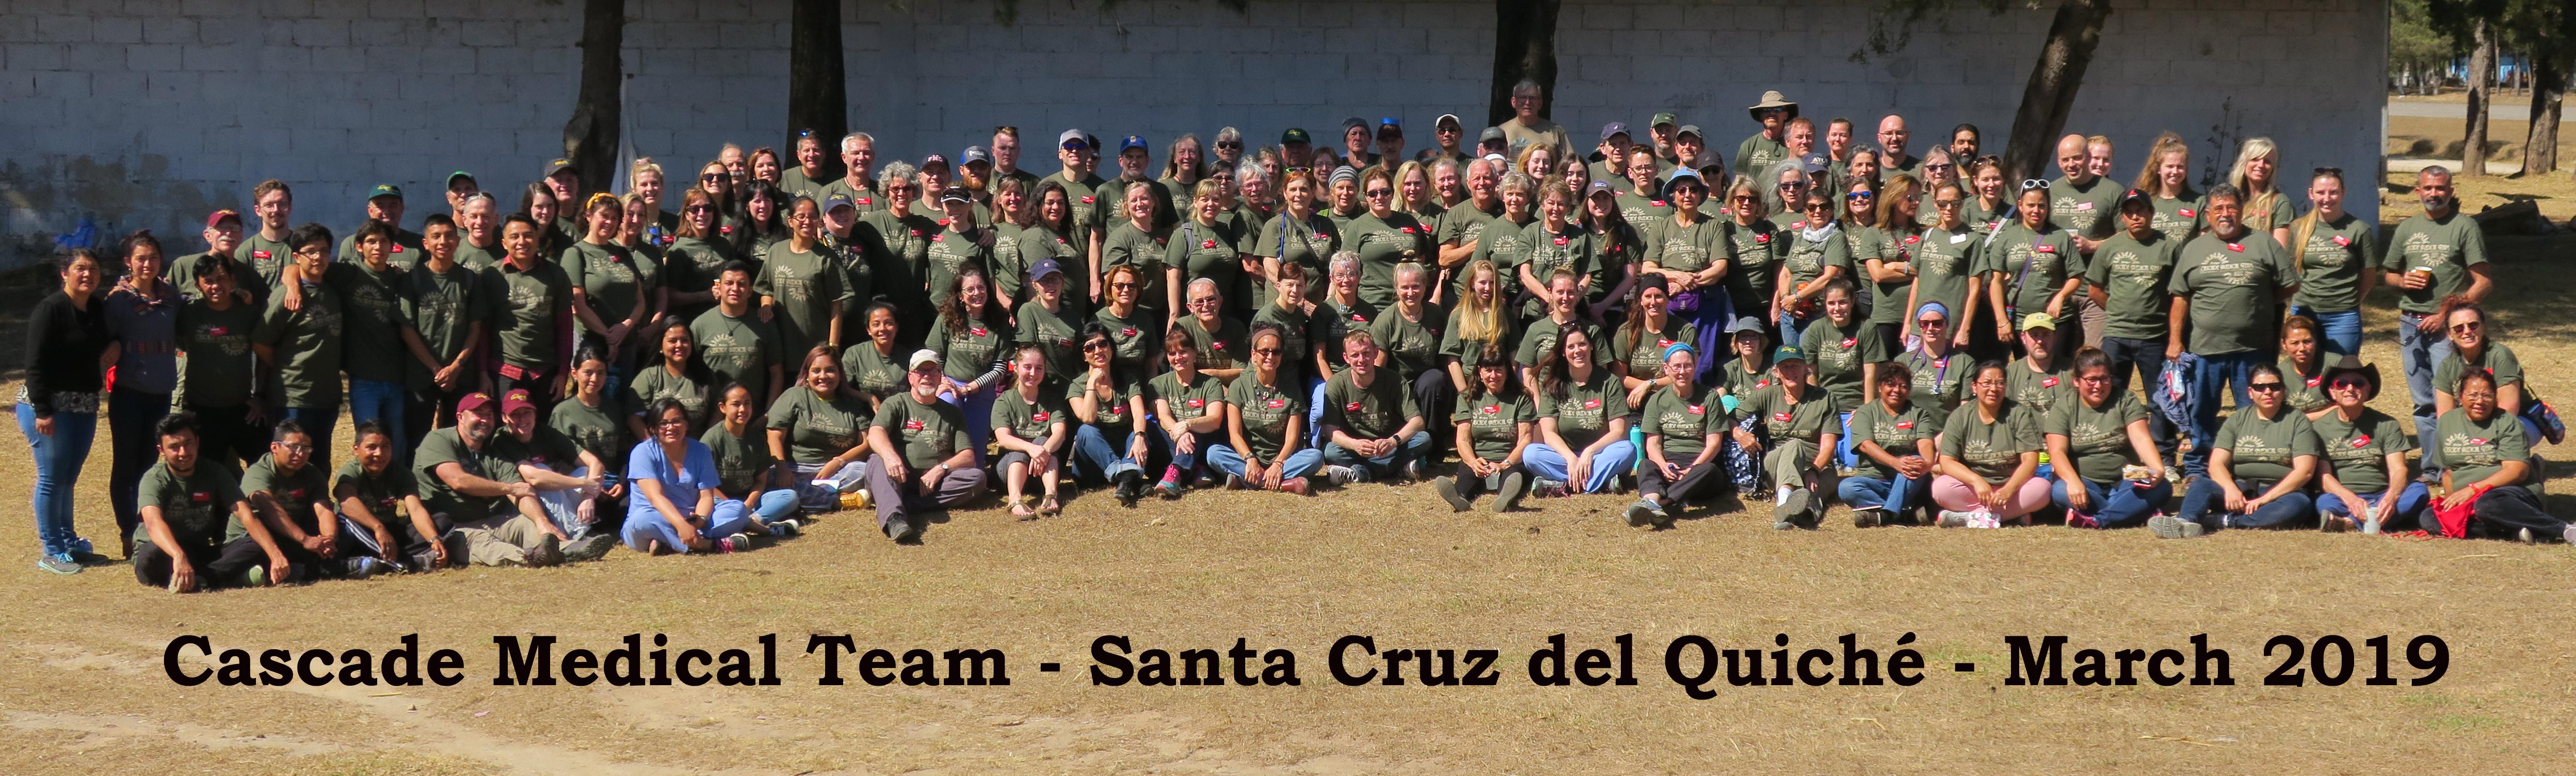 Cascade Medical Team, March 2019 group photo